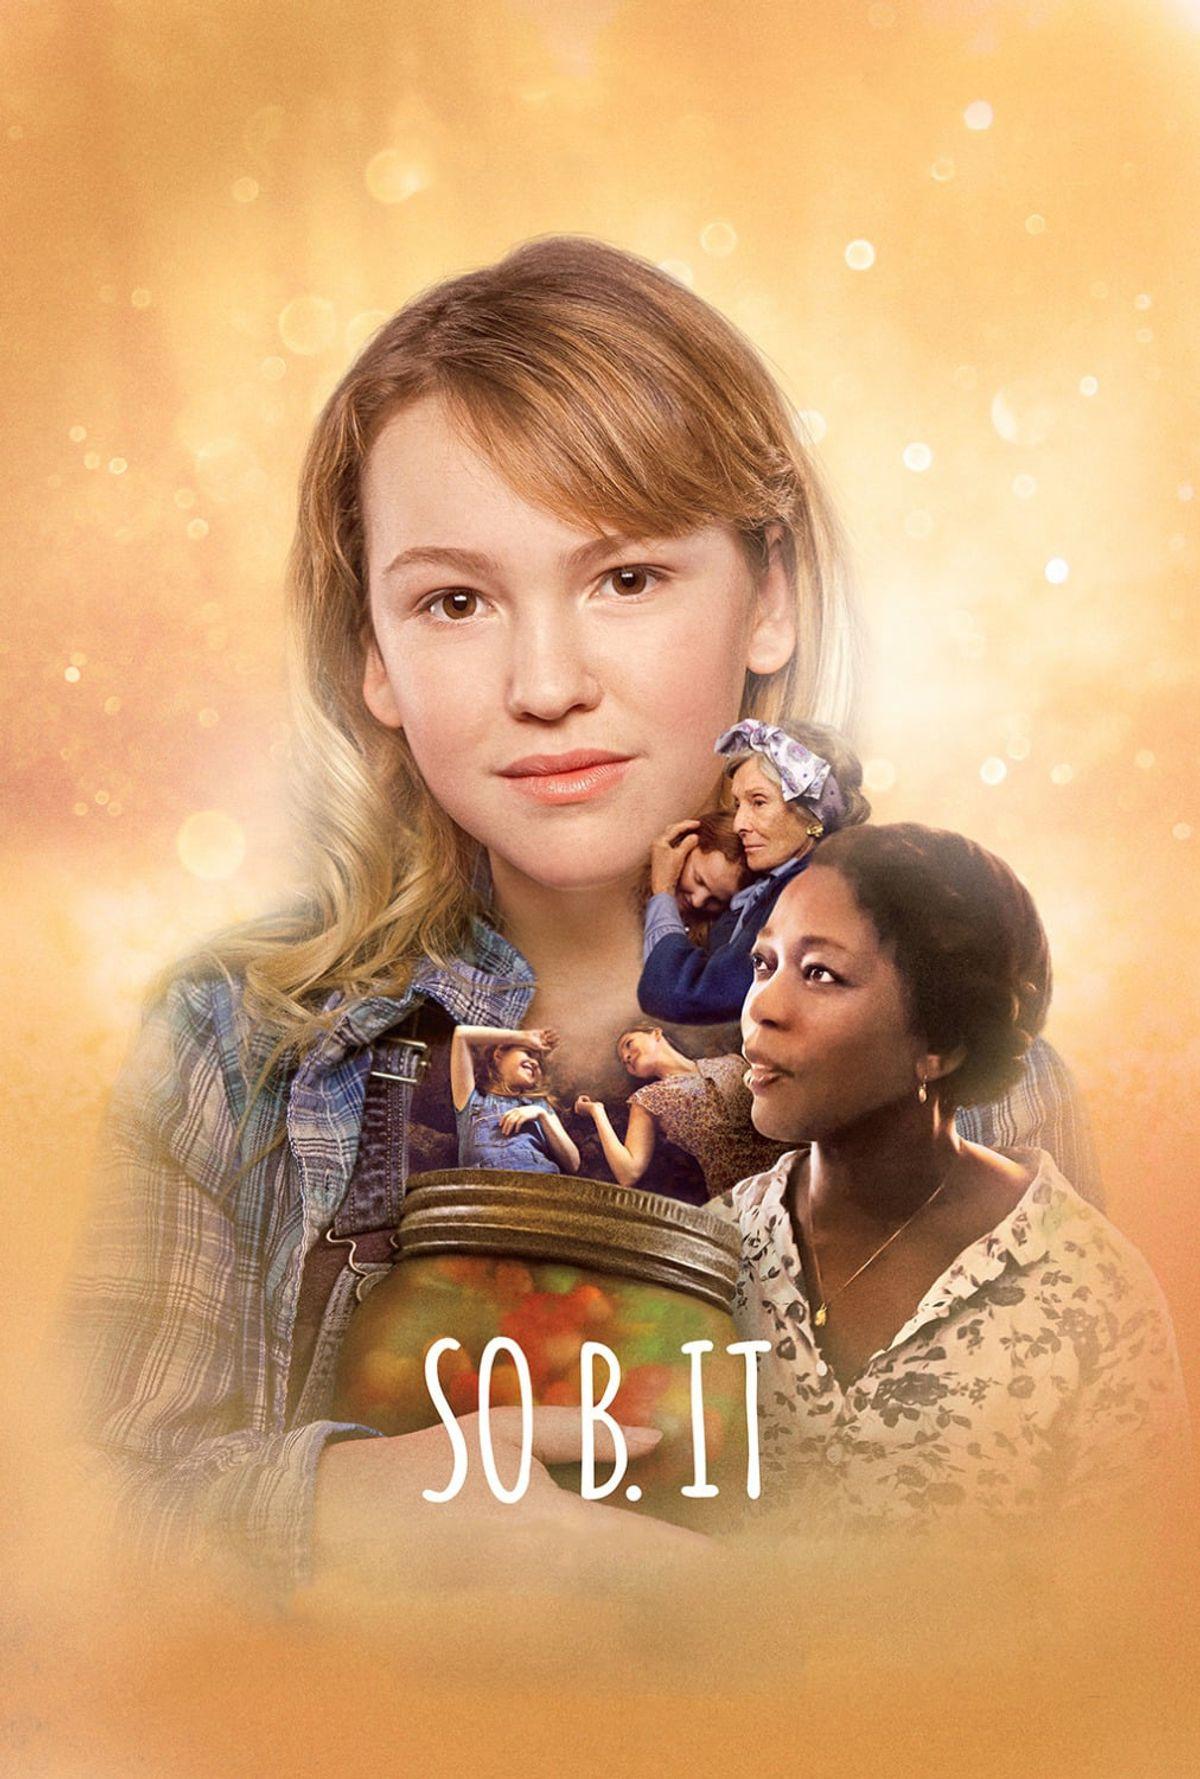 Jacinda Barrett Best Movies, TV Shows and Web Series List